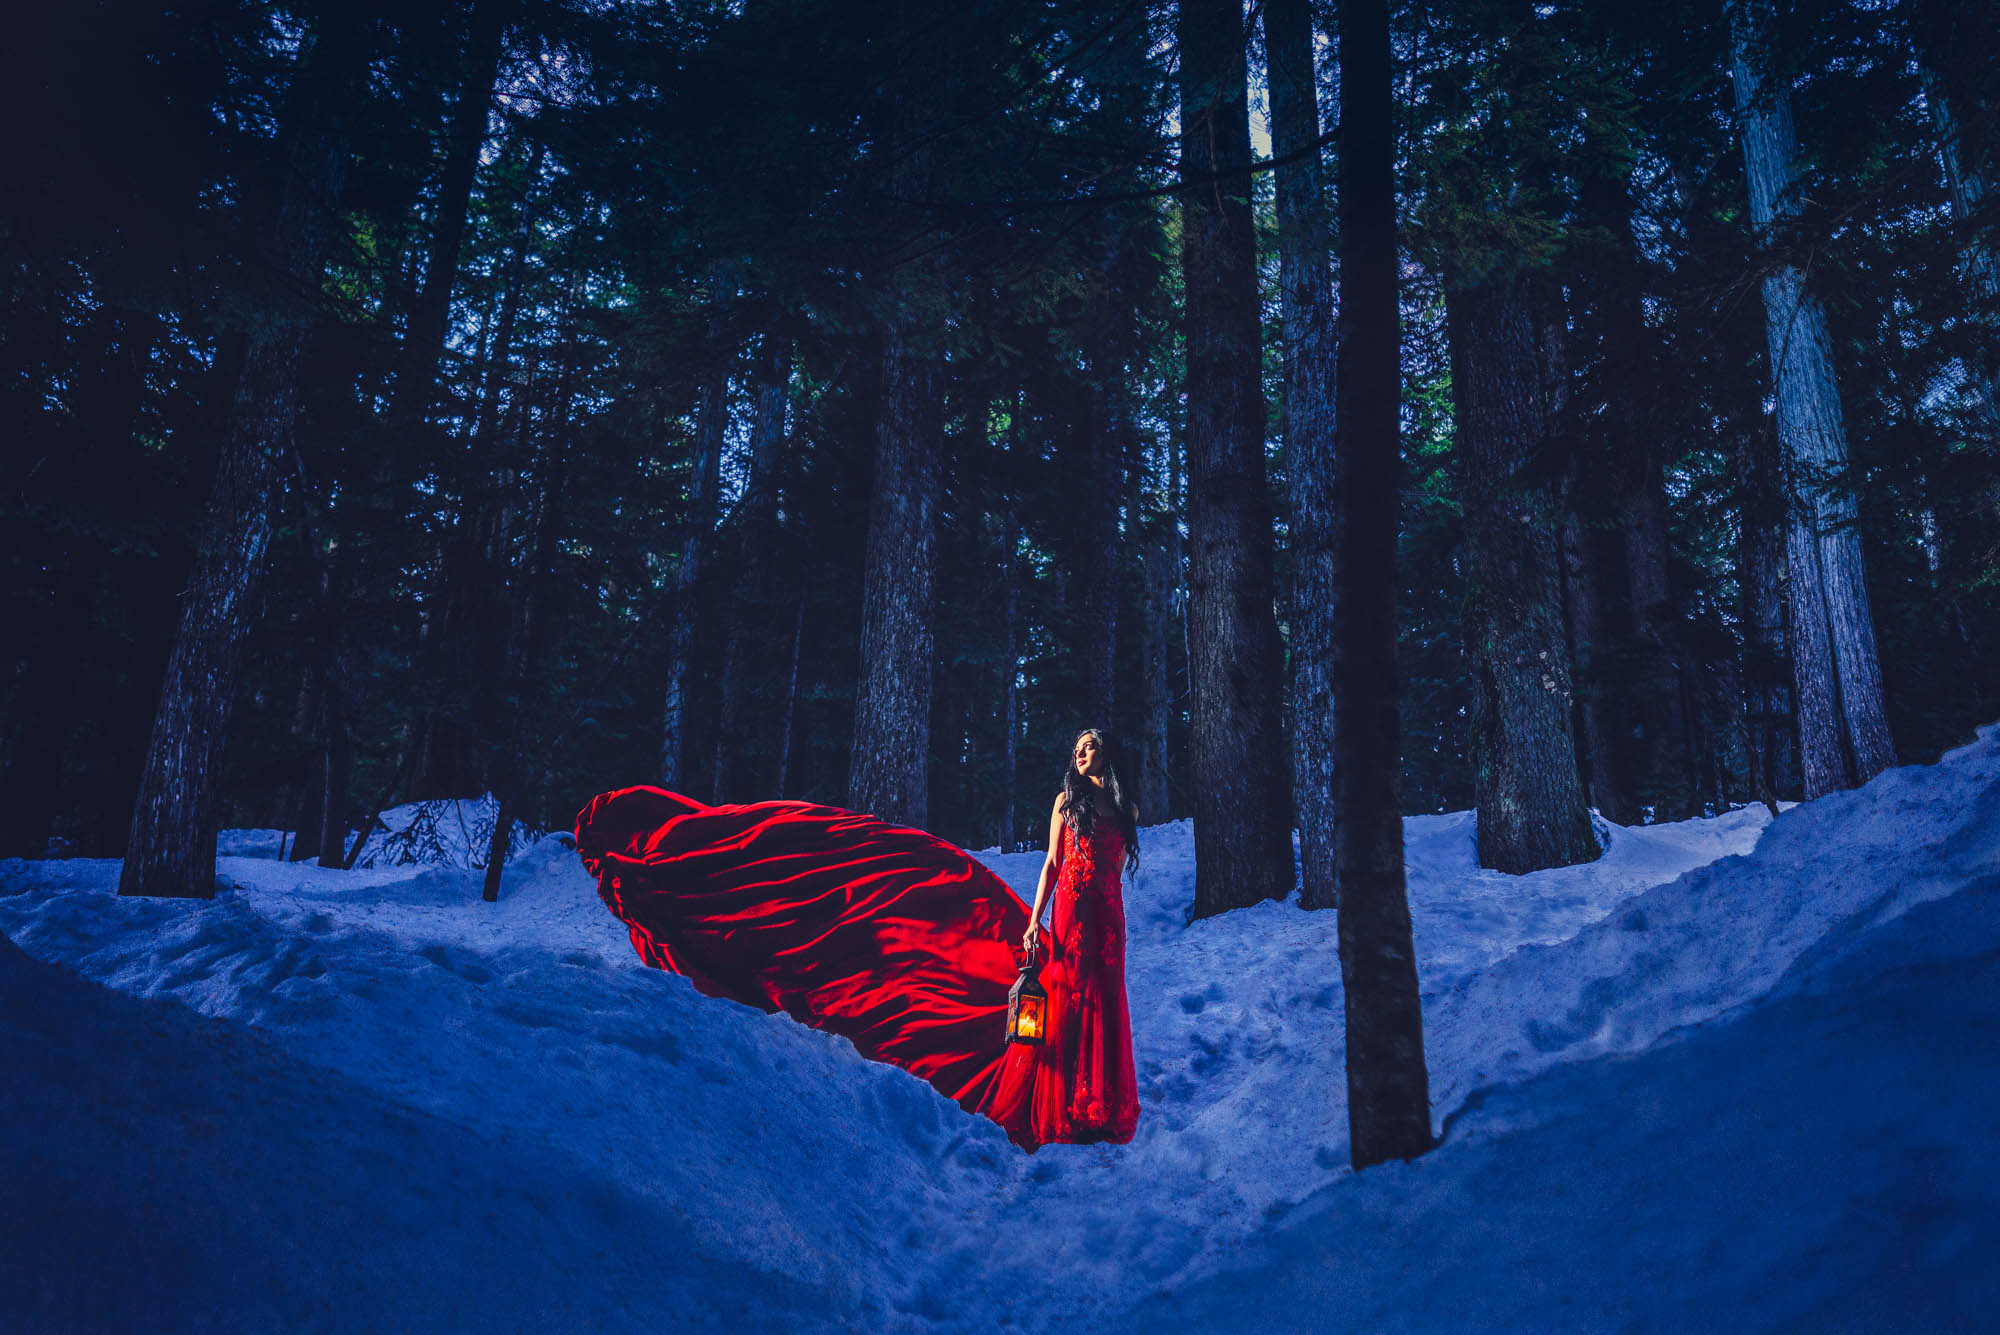 Lex & Josh Cypress Mountain Snow Red Dress Portrait Shoot-4.jpg